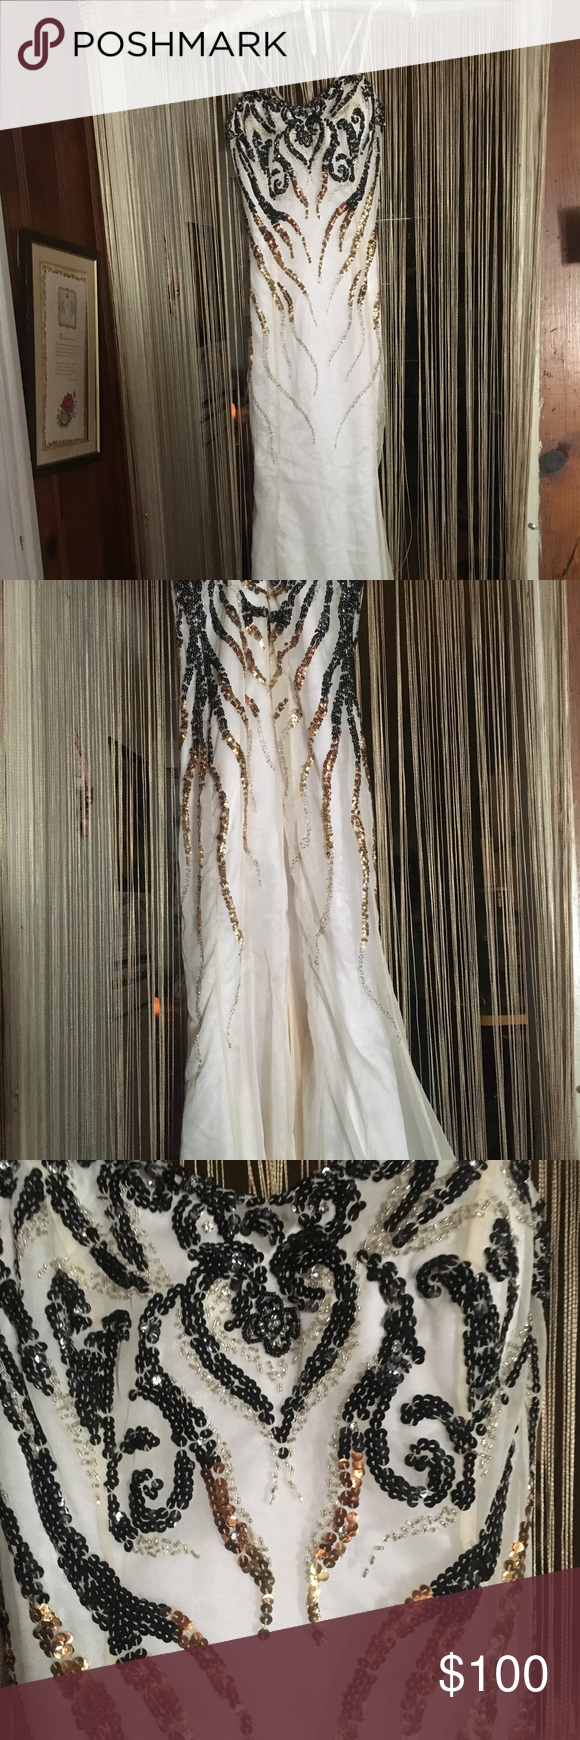 Firm white mermaid dress for wedding and prom my posh closet